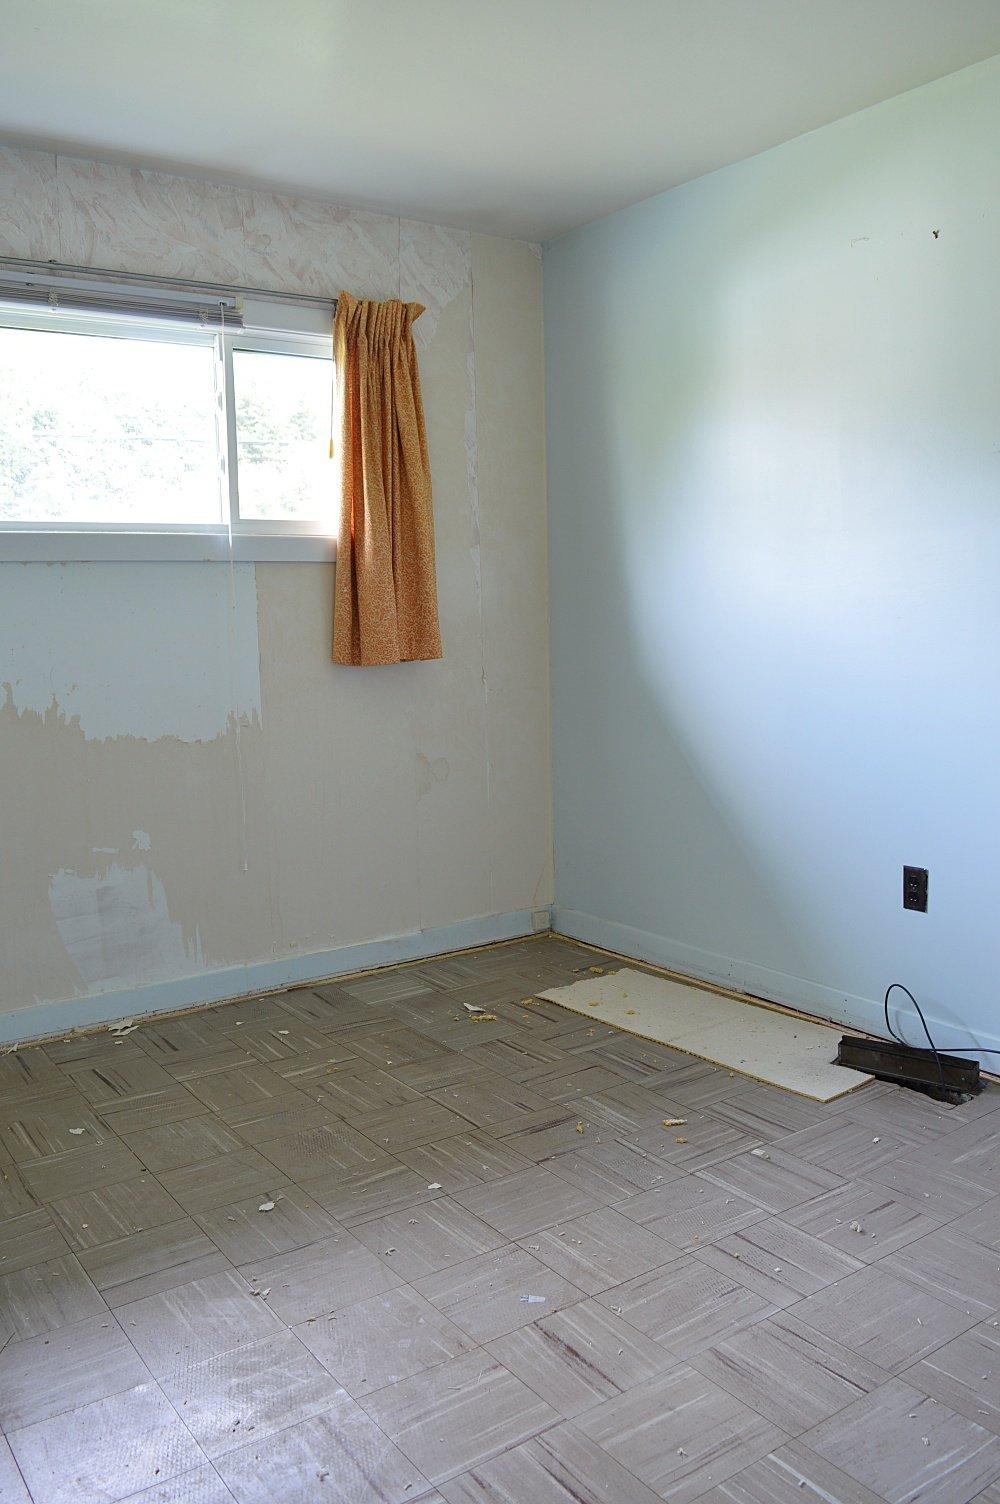 rental house renovation removing wallpaper